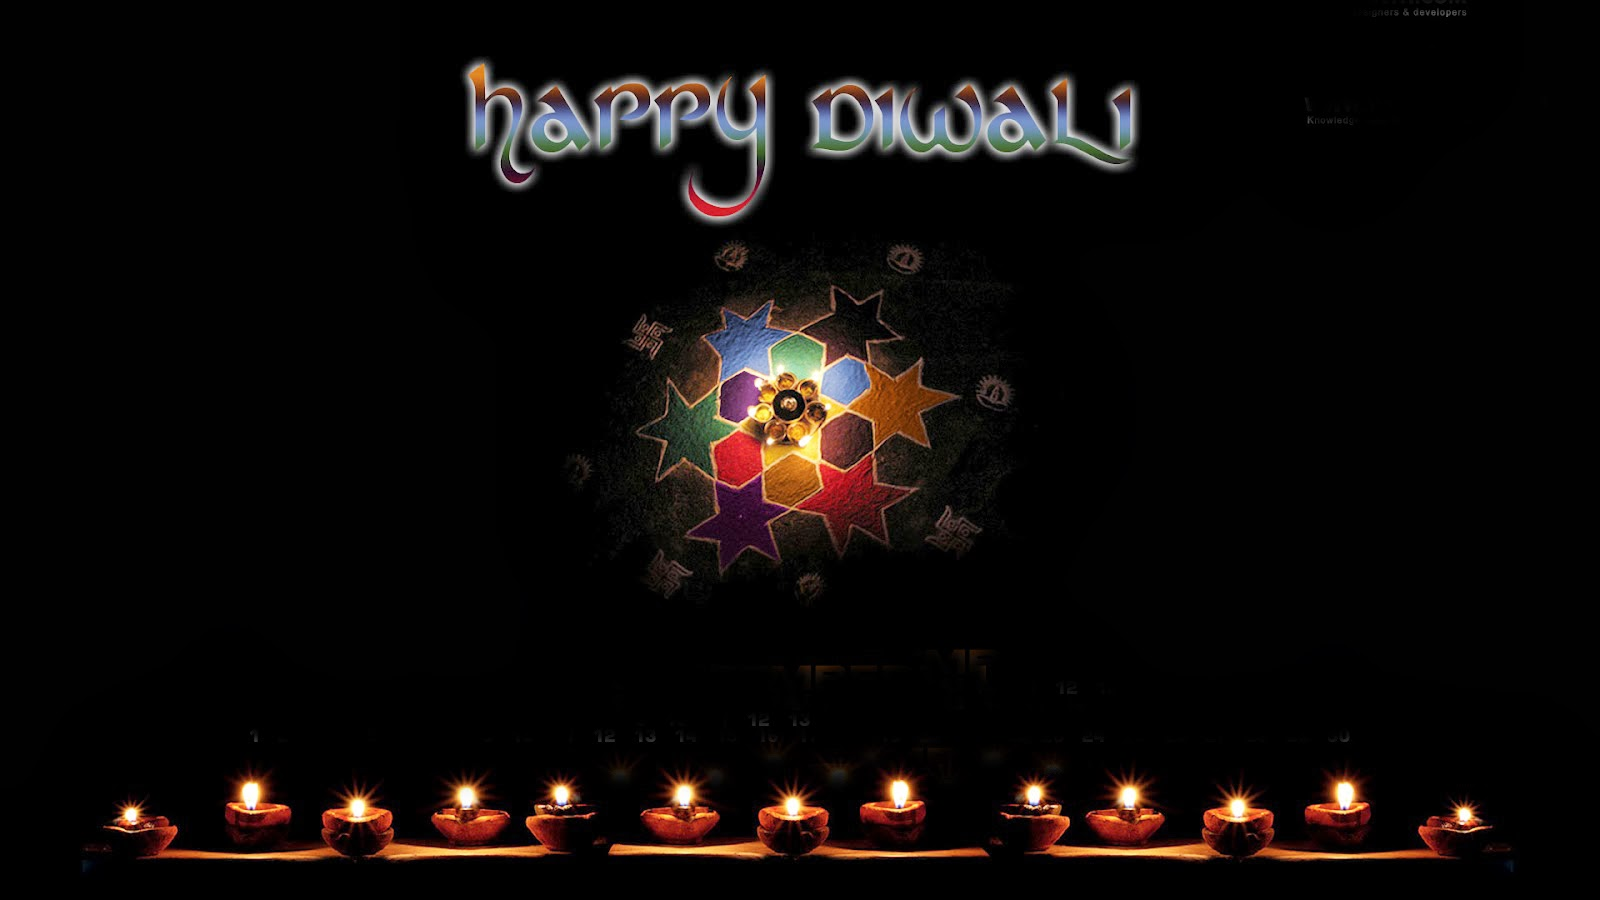 happy diwali widescreen hd - photo #8